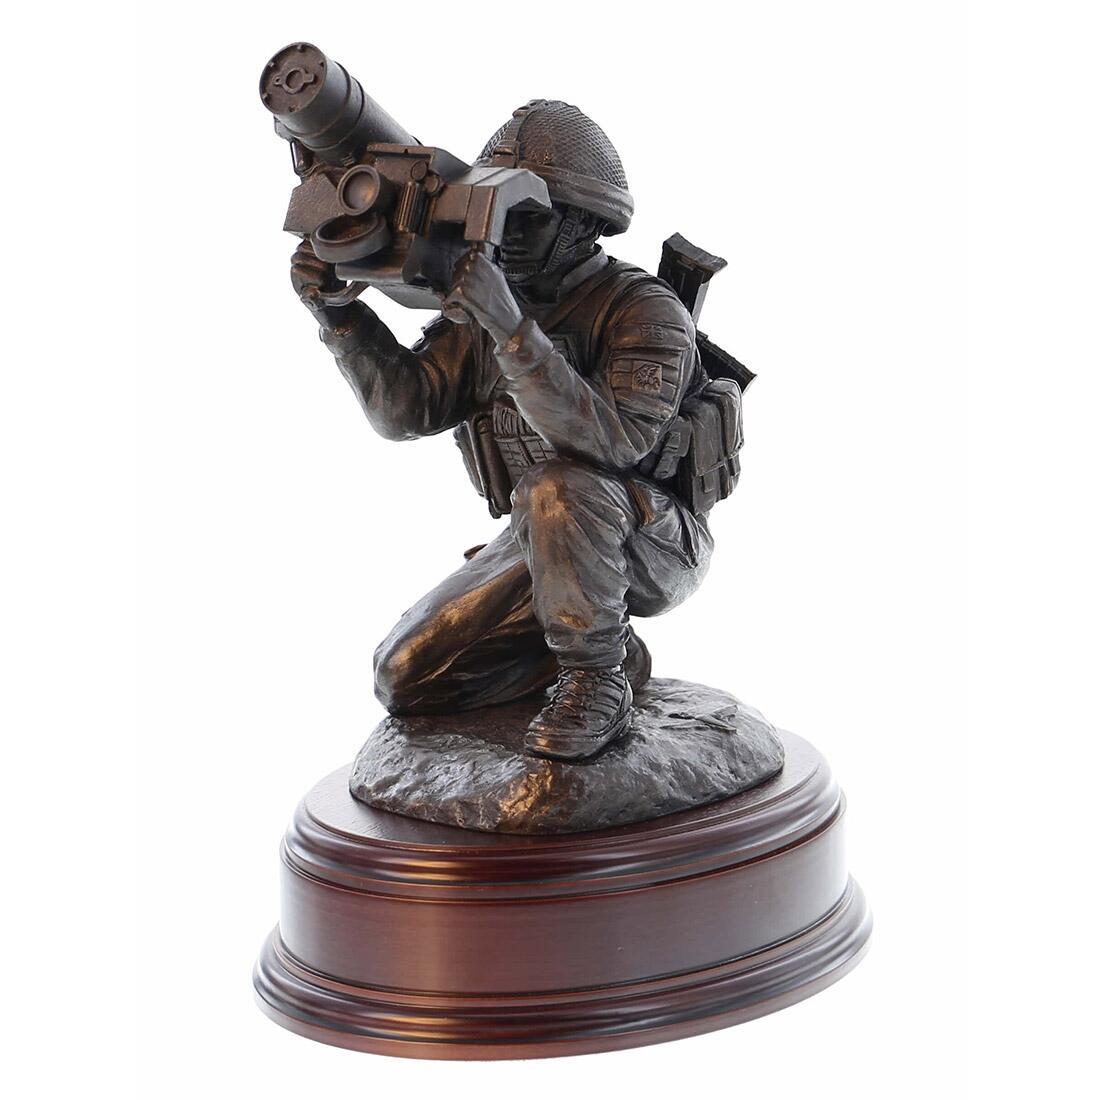 Para Javelin Anti Tank Firer Statues (Resin Bronze)